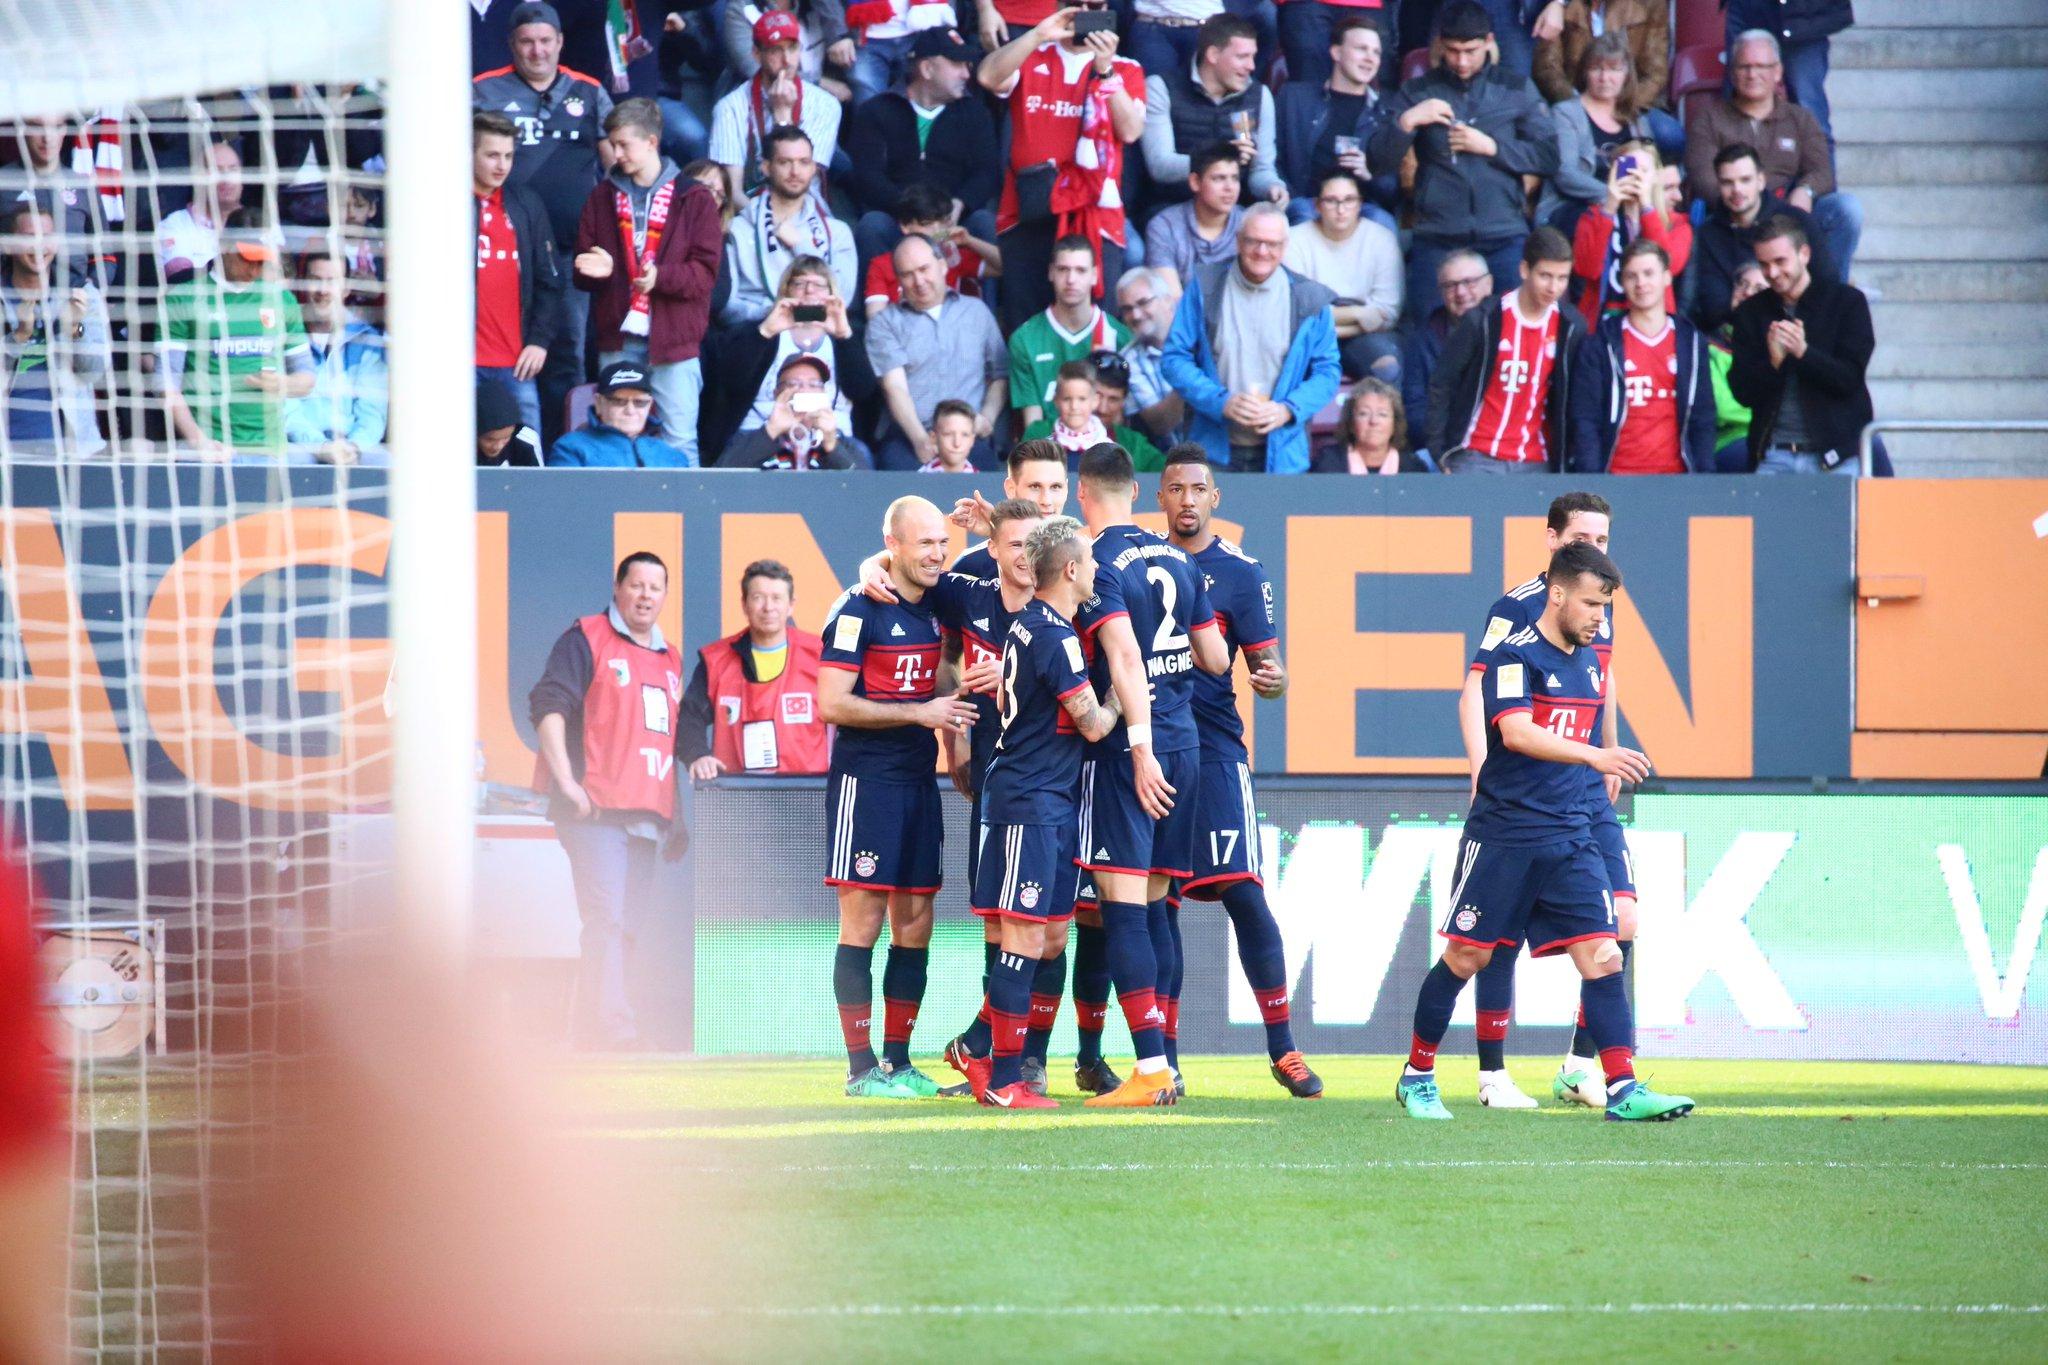 FC Augsburg vs Bayern Munich 1-4 Highlights